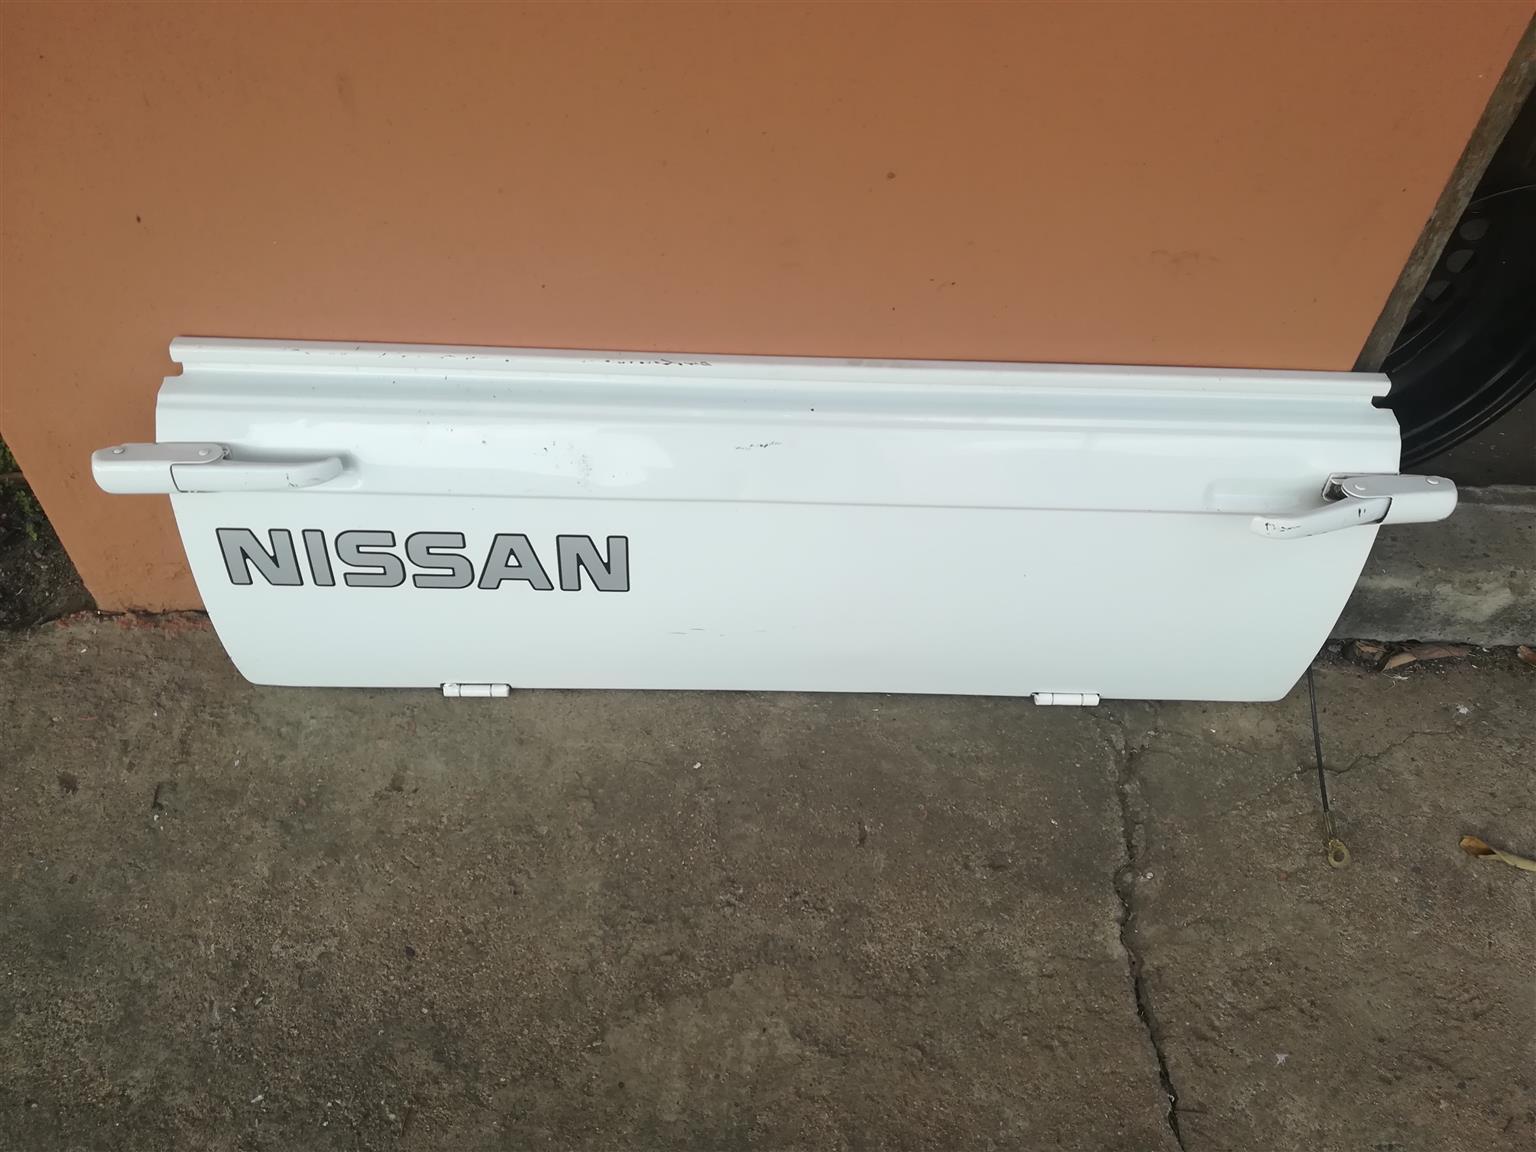 Nissan 1400 tailgates